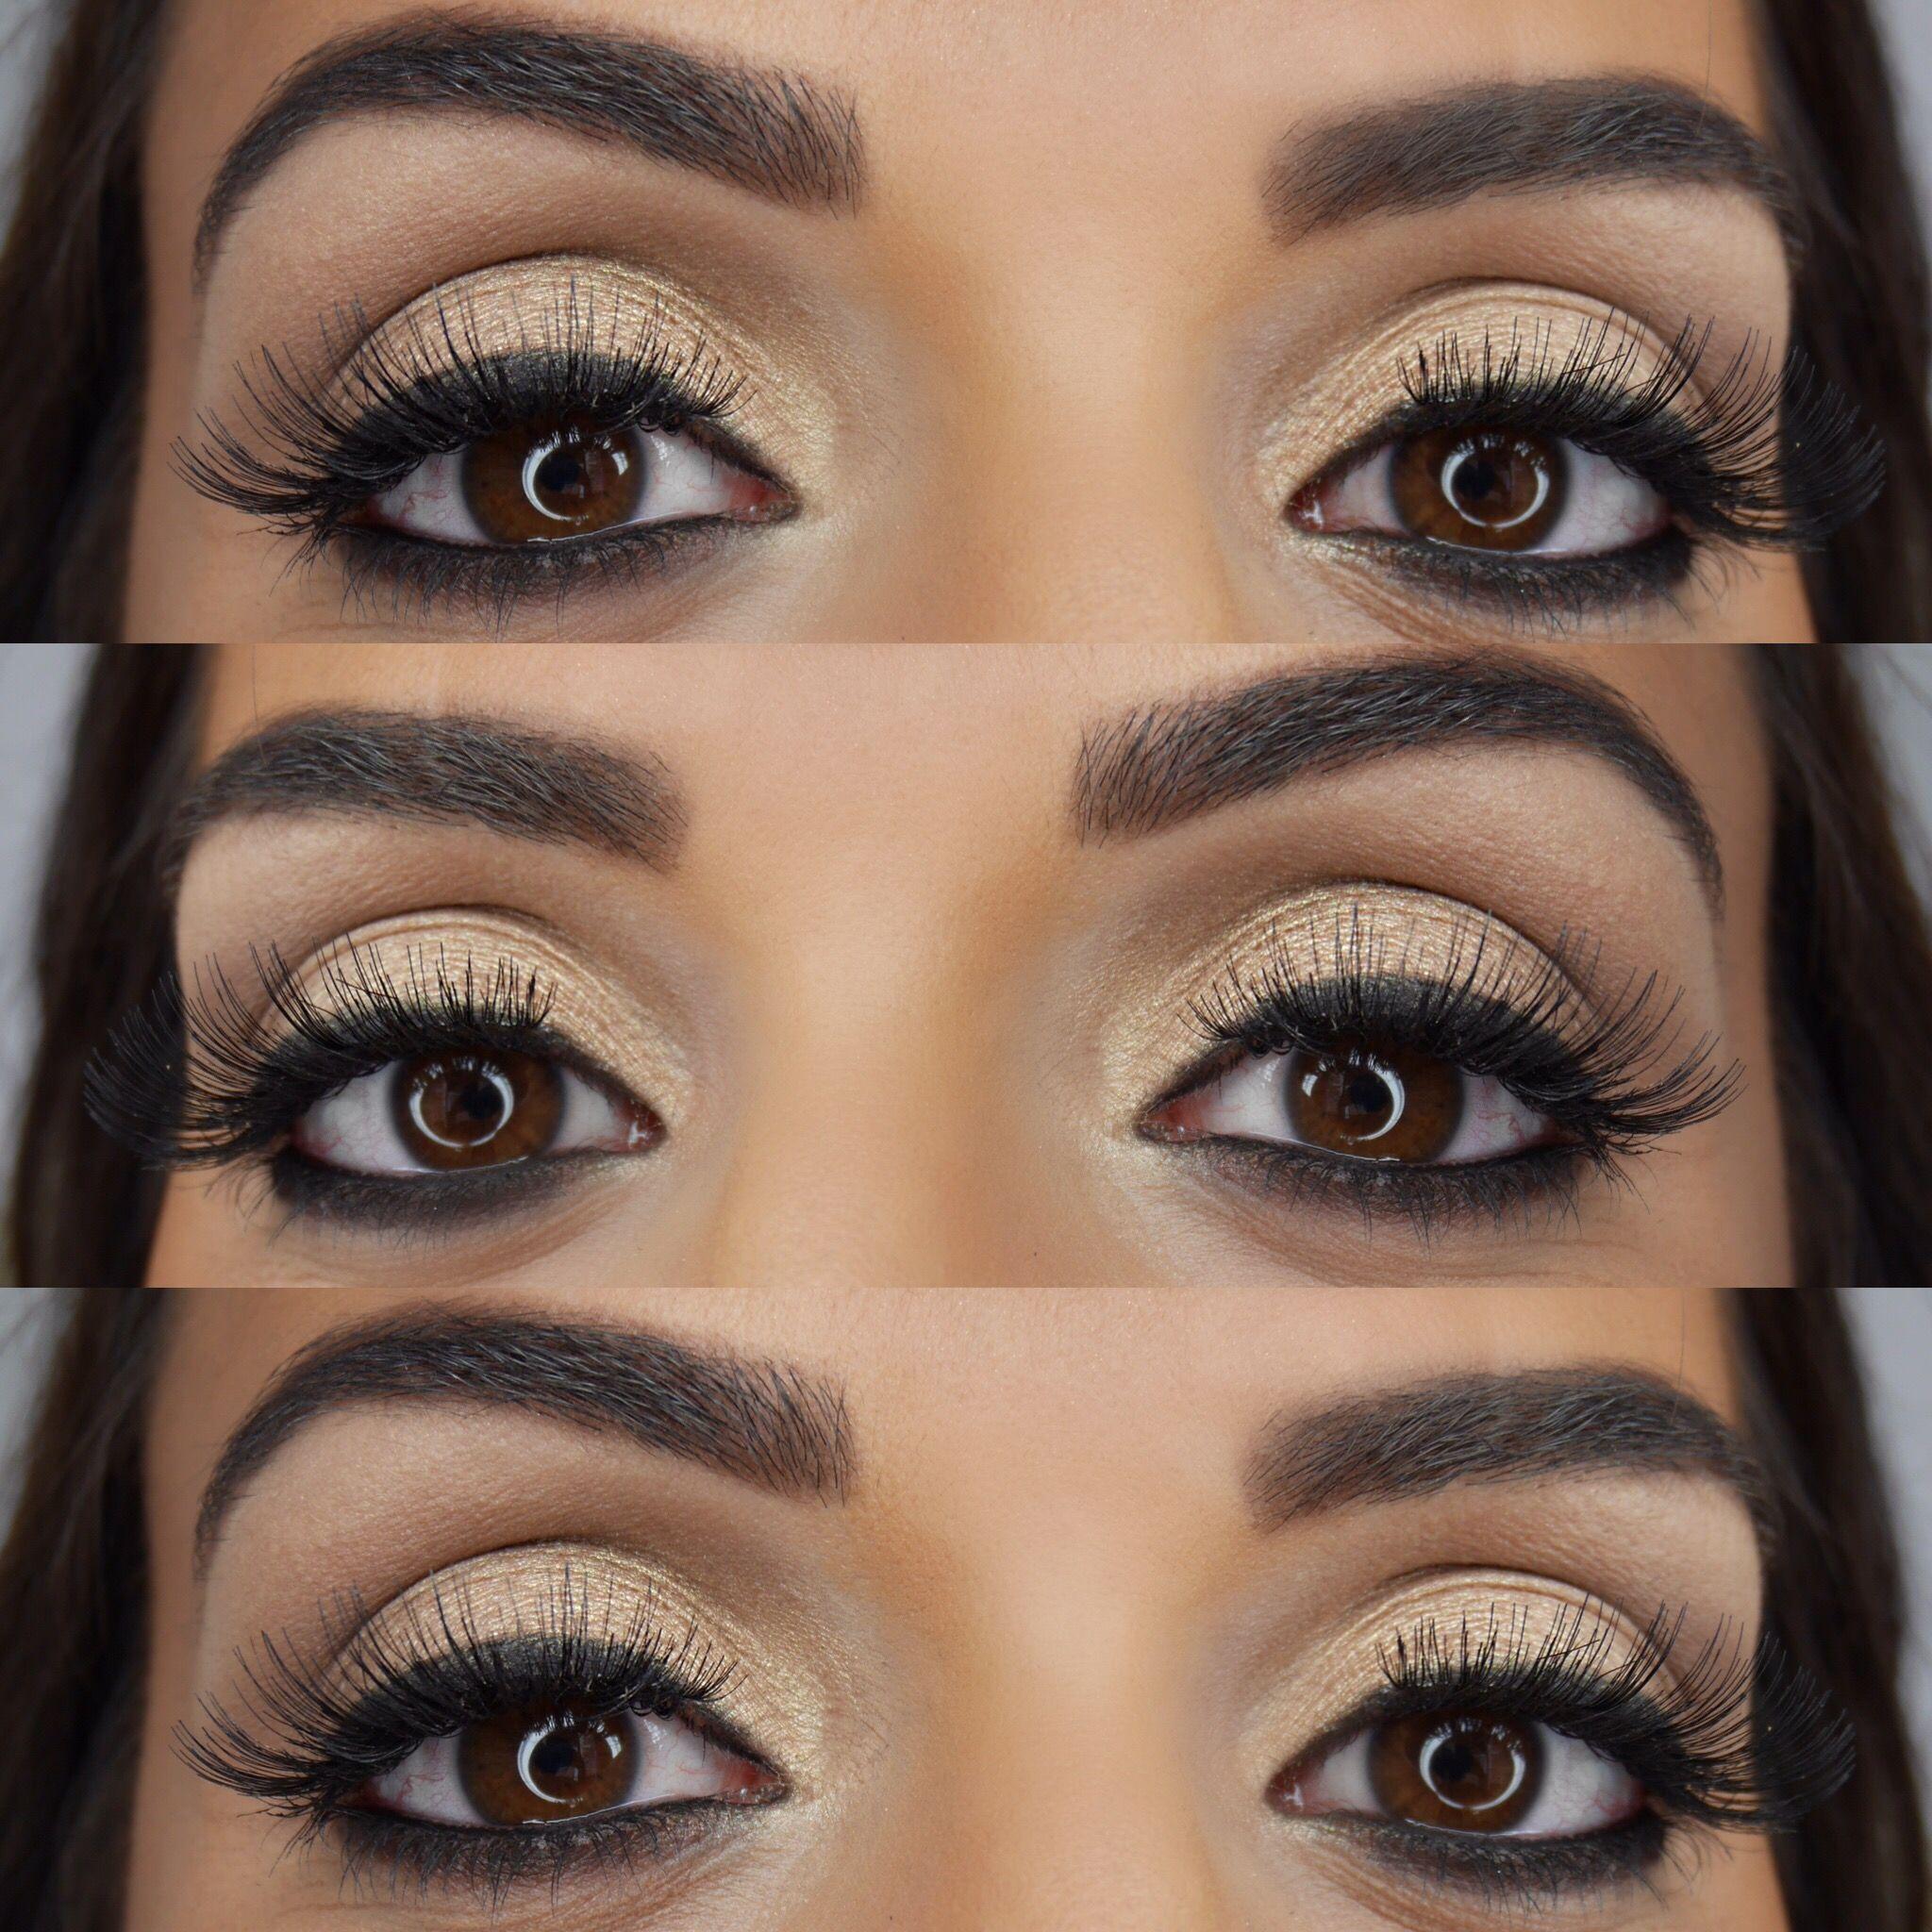 Eye makeup brown eyes gold eyeshadow round eyes brows eyebrows